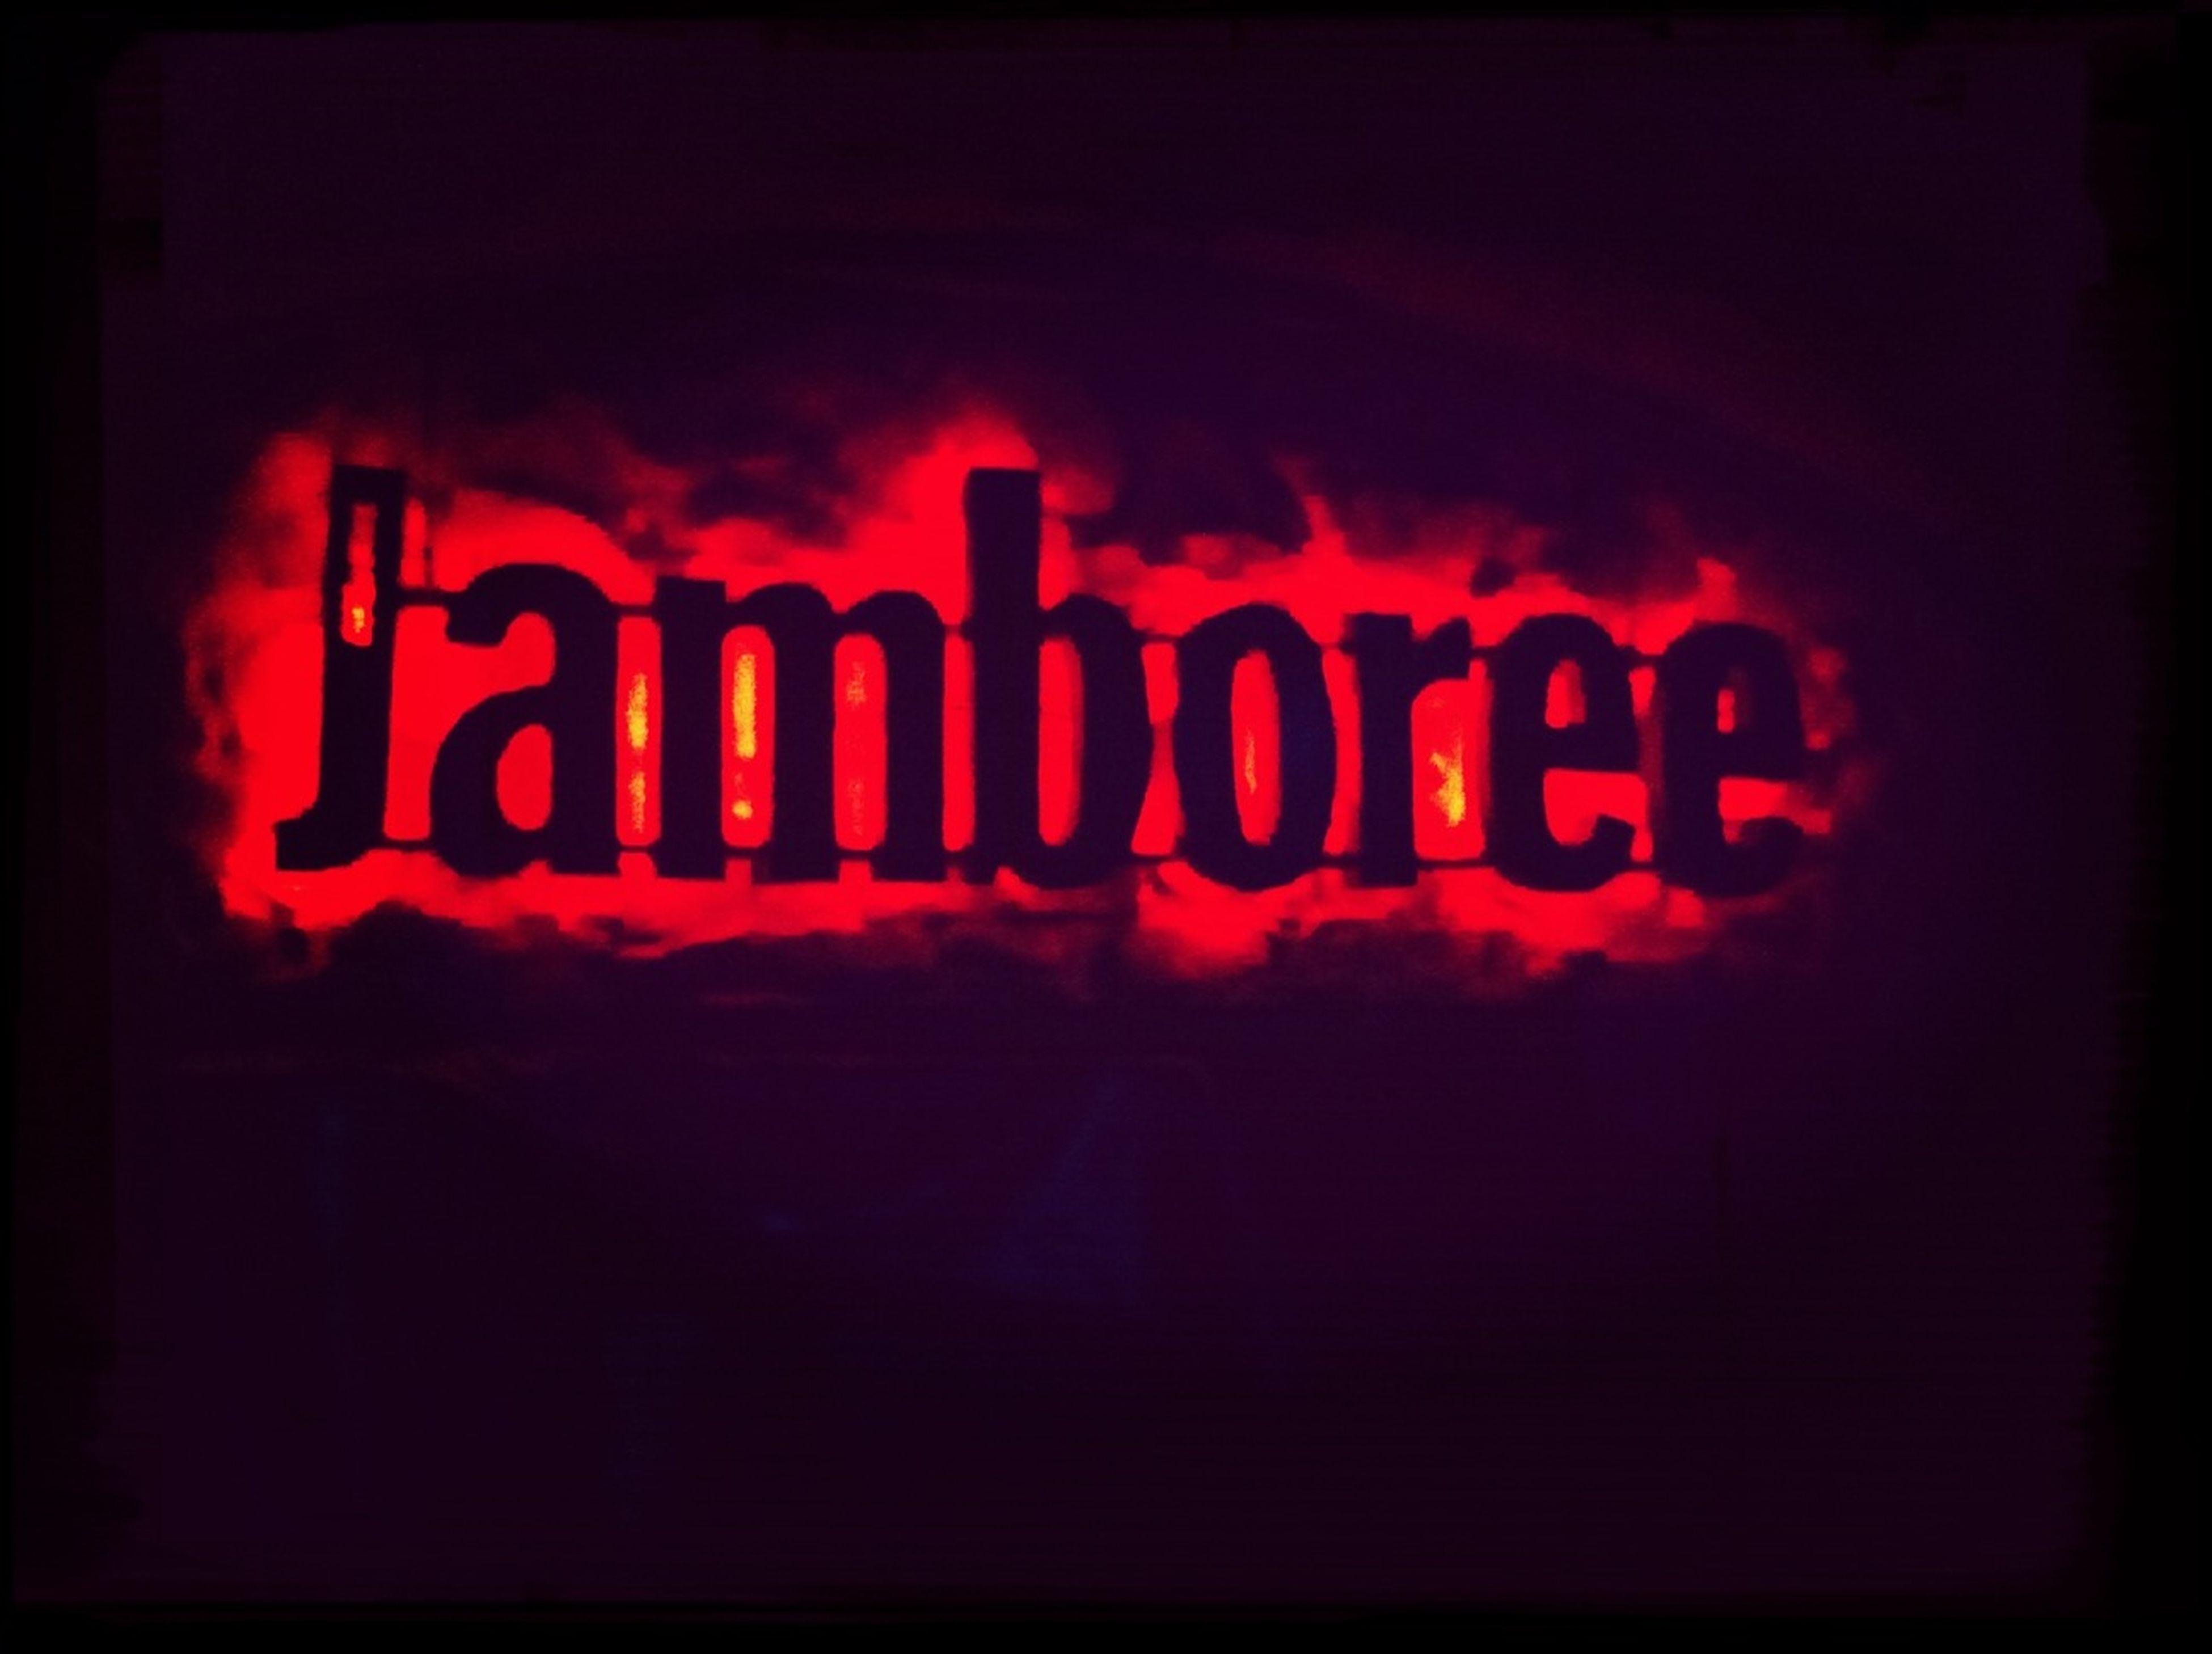 Party Jamboree Night